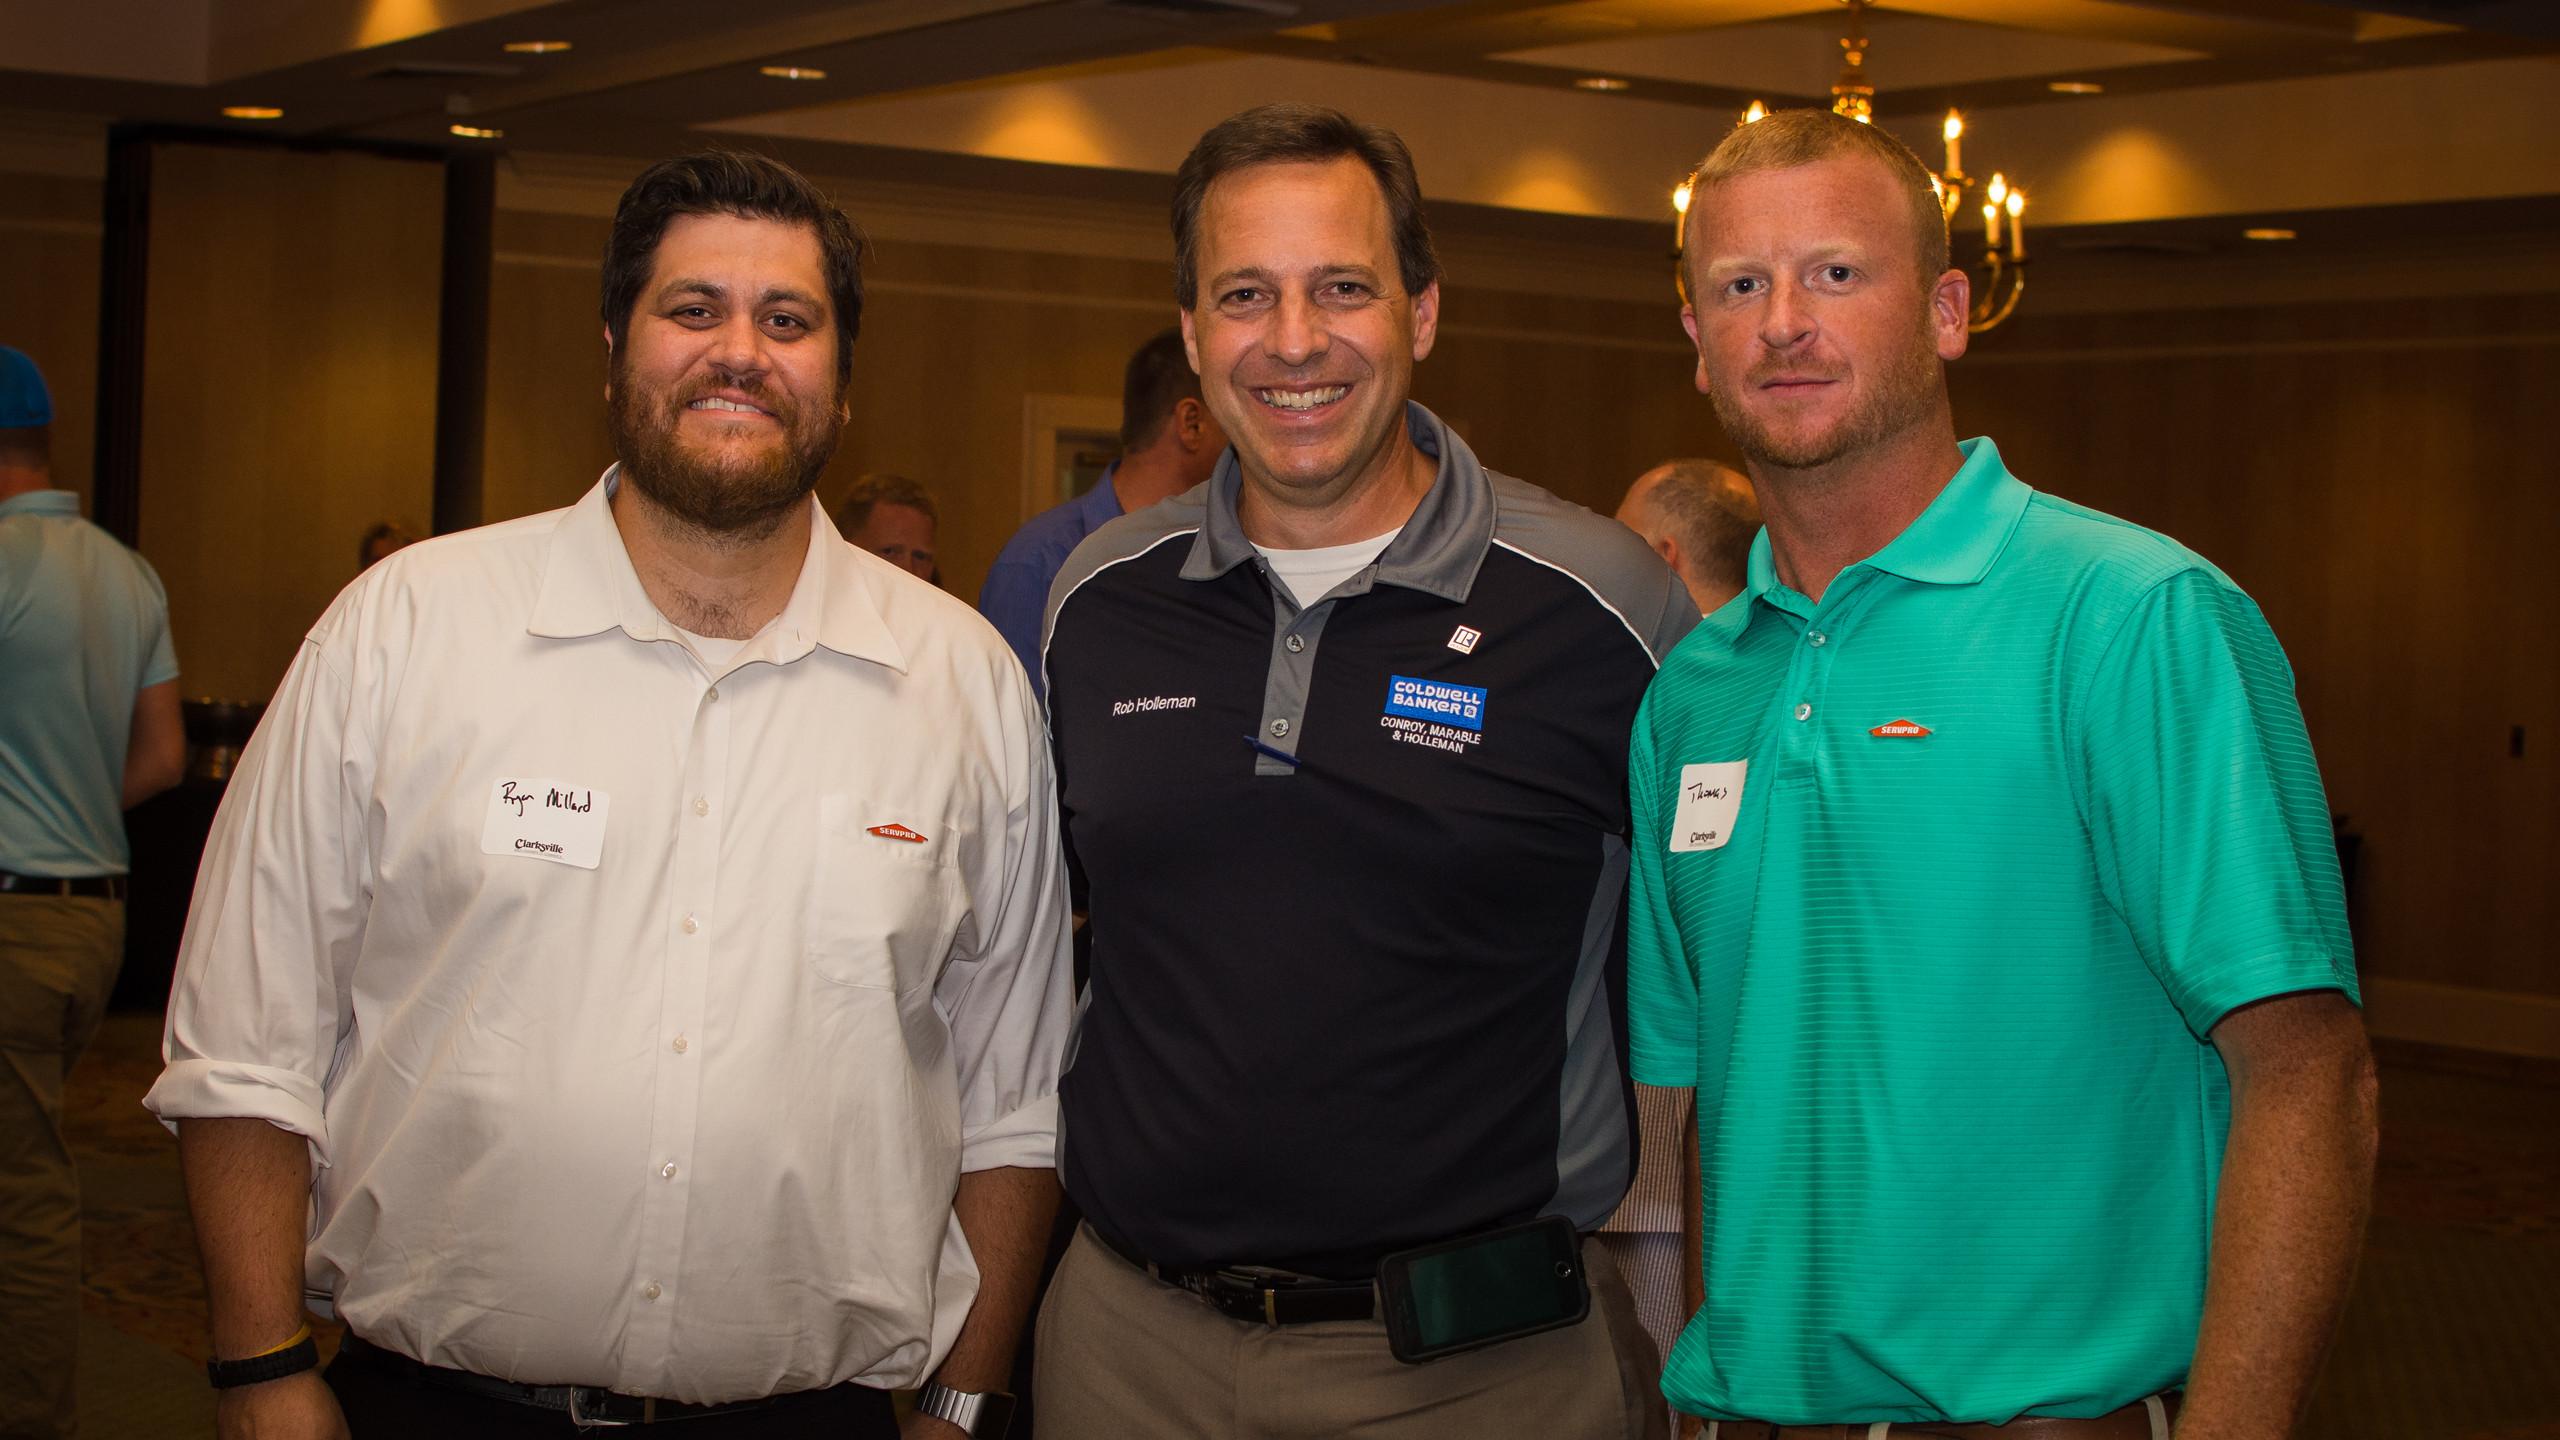 Ryan Millard, Rob Holleman, and Mr